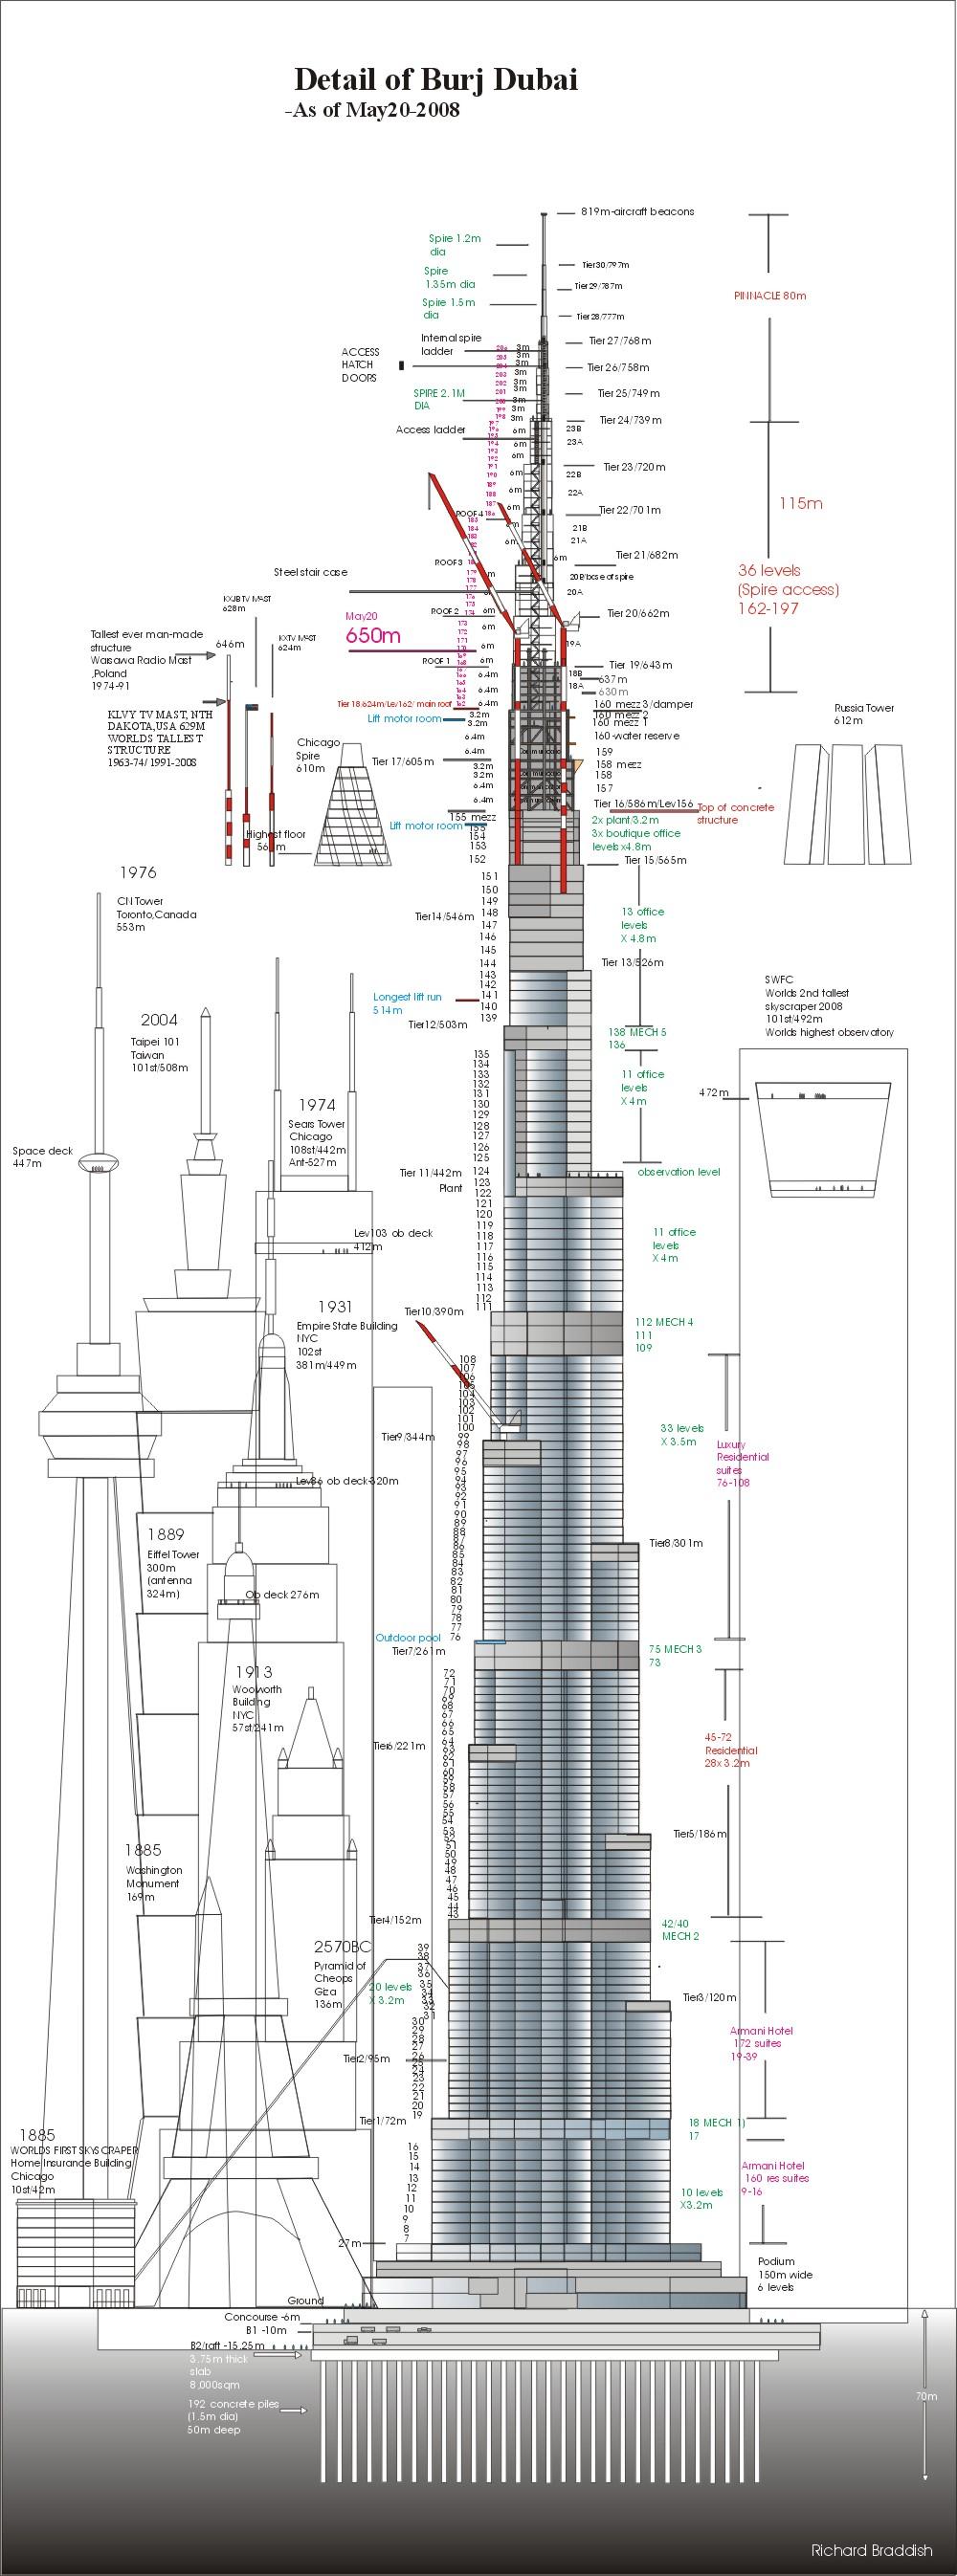 DUBAI  Burj Dubai / Khalifa SOM 828 mètres 164 ét Construite  Page 9  SkyscraperCity - Eiffel Tower Floor Plan